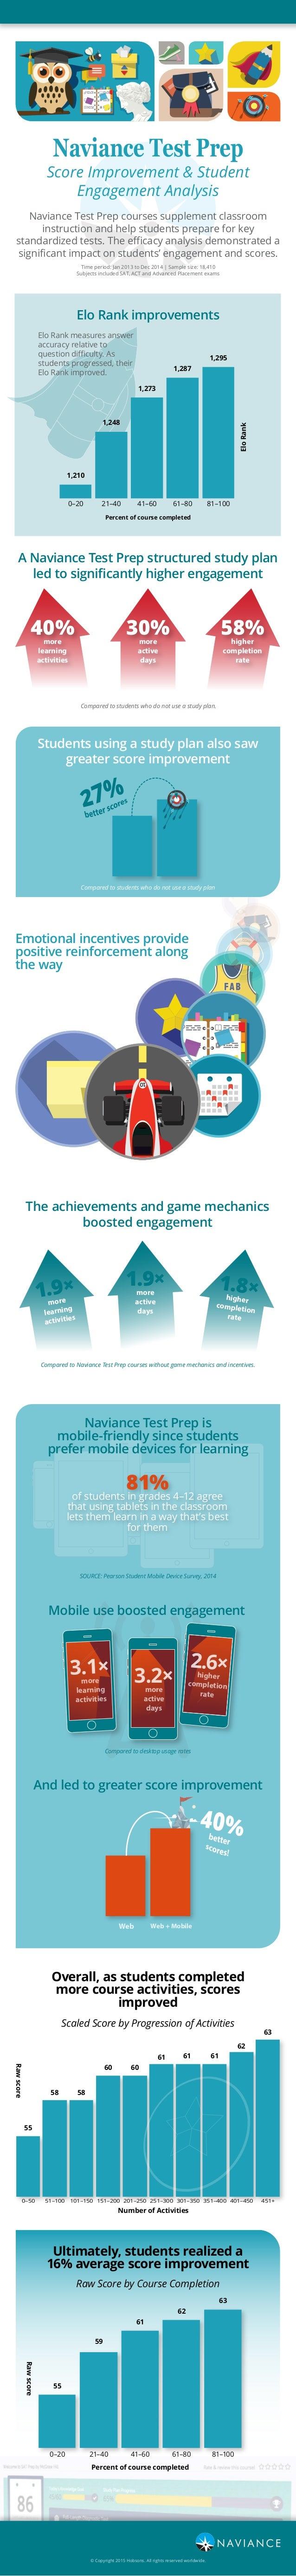 Naviance Test Prep Score Improvement & Student Engagement Analysis A Naviance Test Prep structured study plan led to signi...